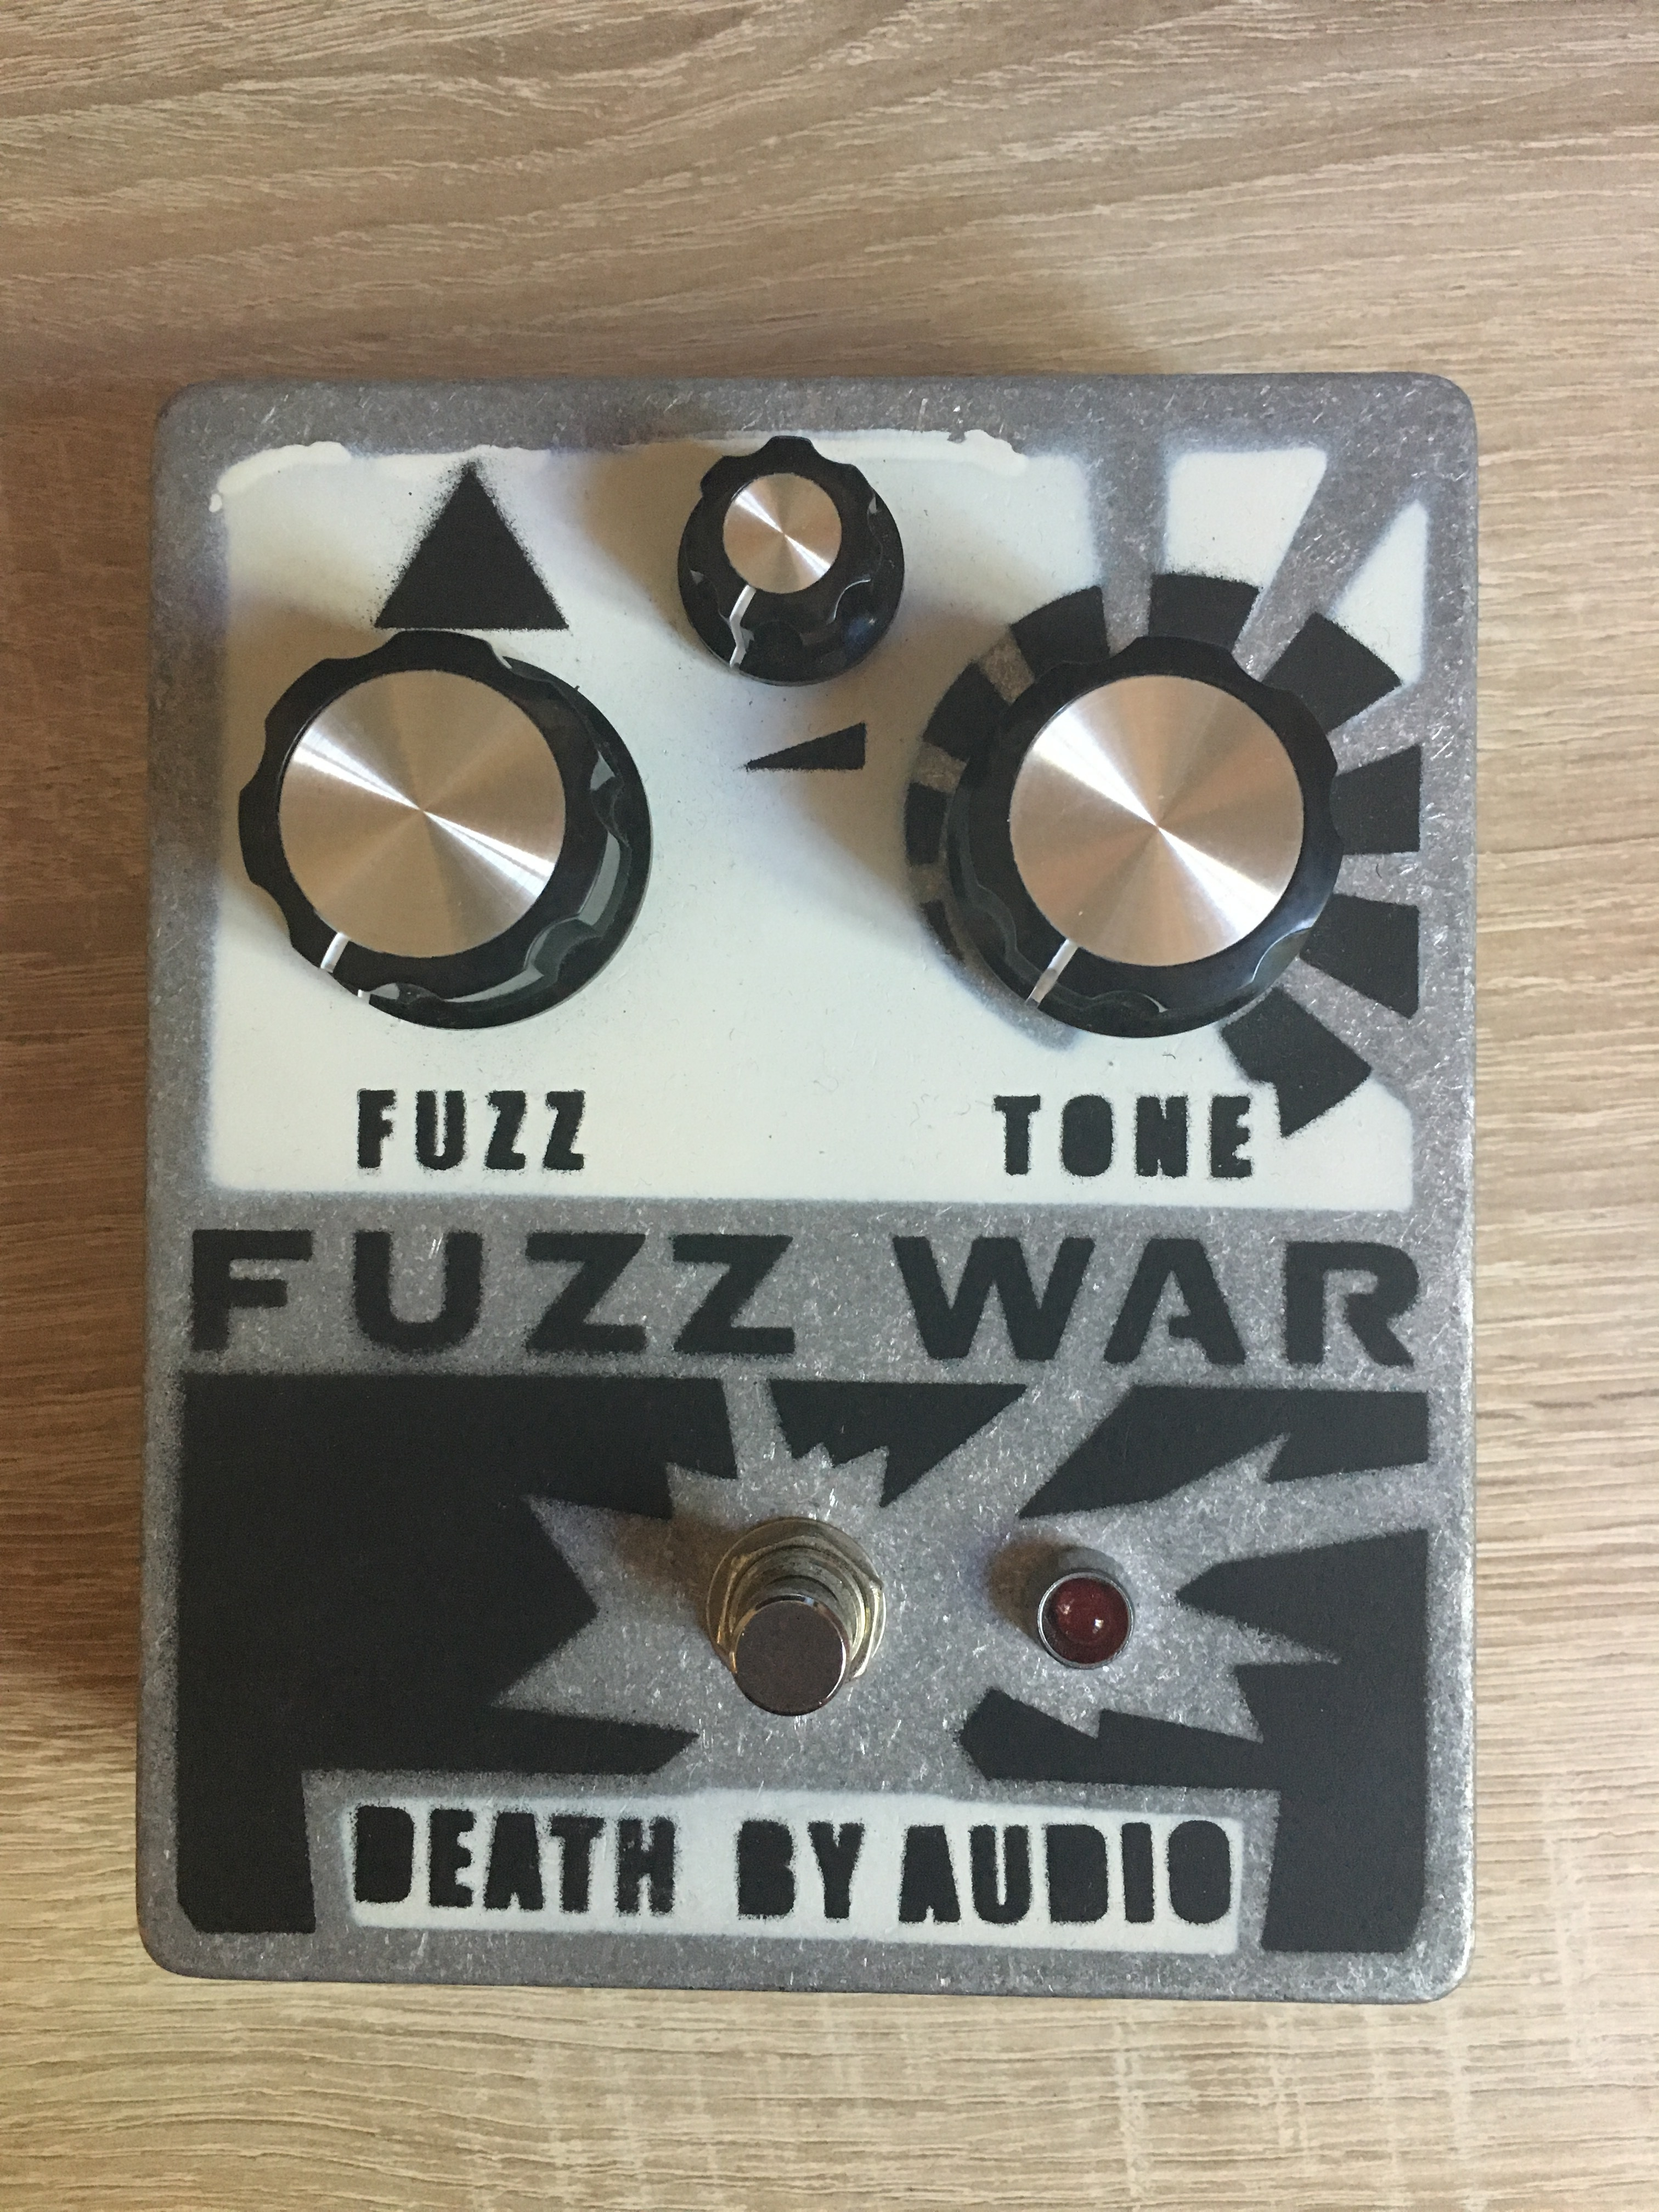 death by audio fuzz war image 1455369 audiofanzine. Black Bedroom Furniture Sets. Home Design Ideas